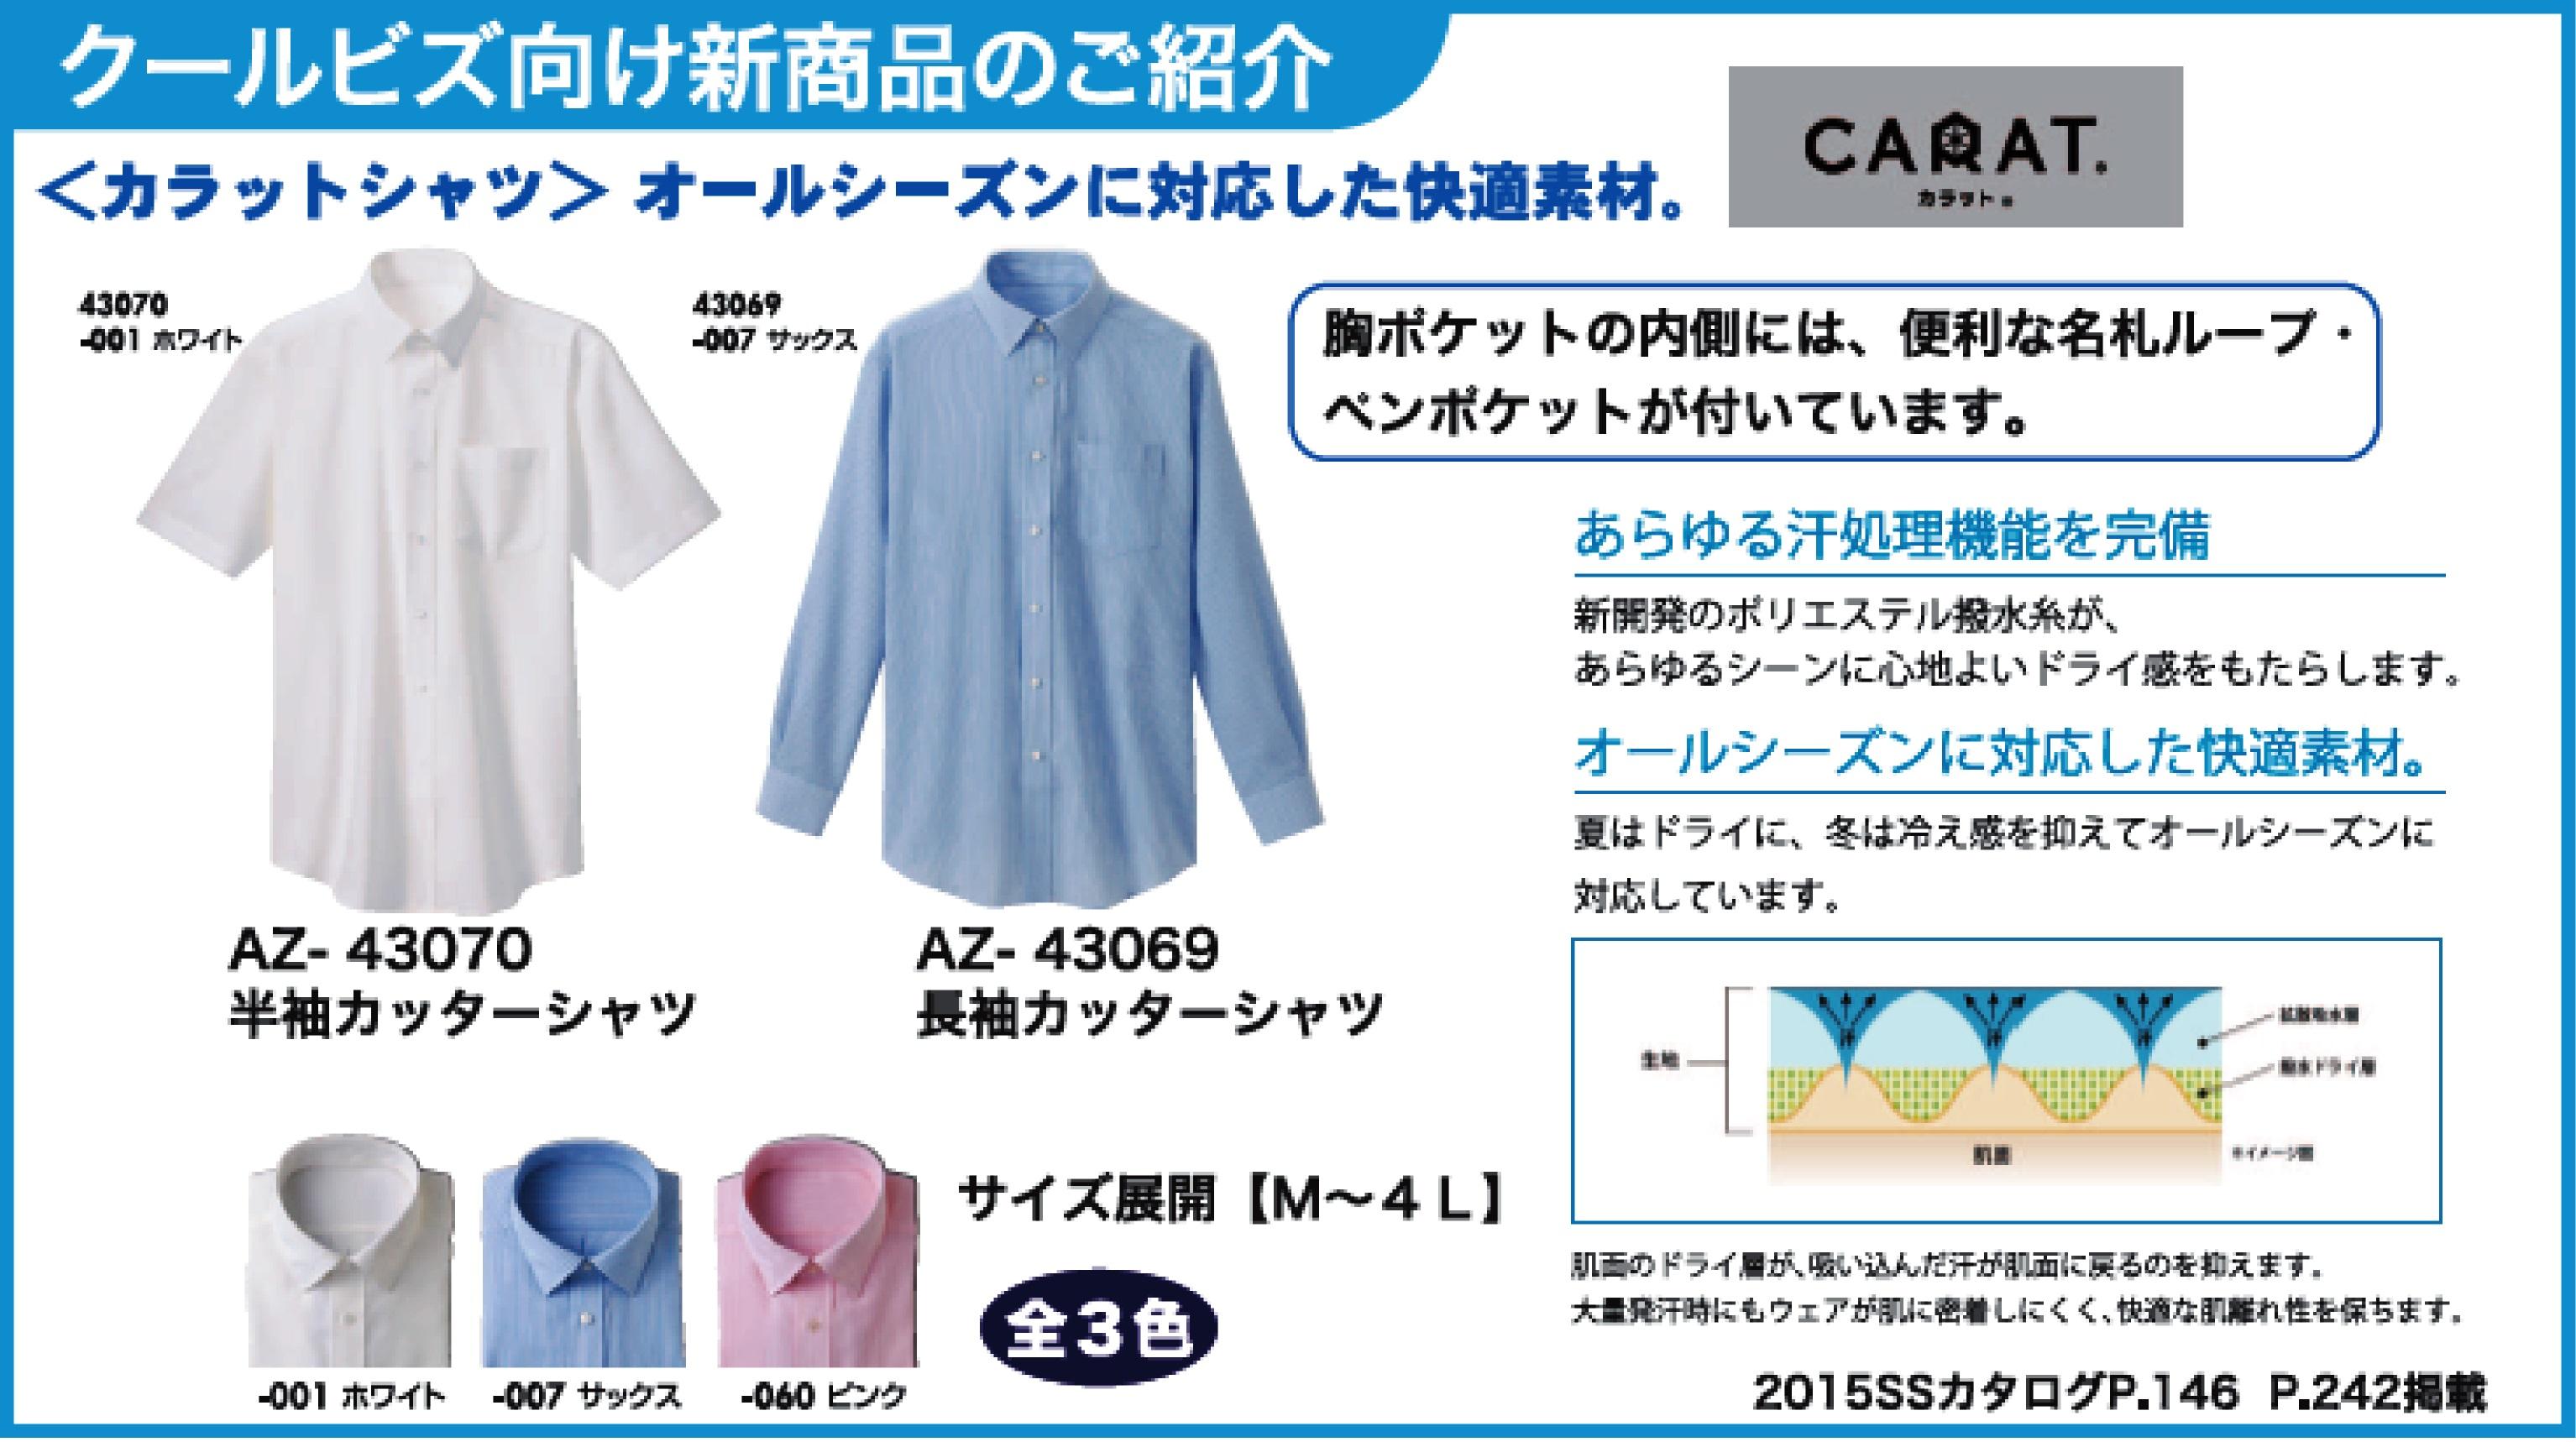 CARAT.jpg